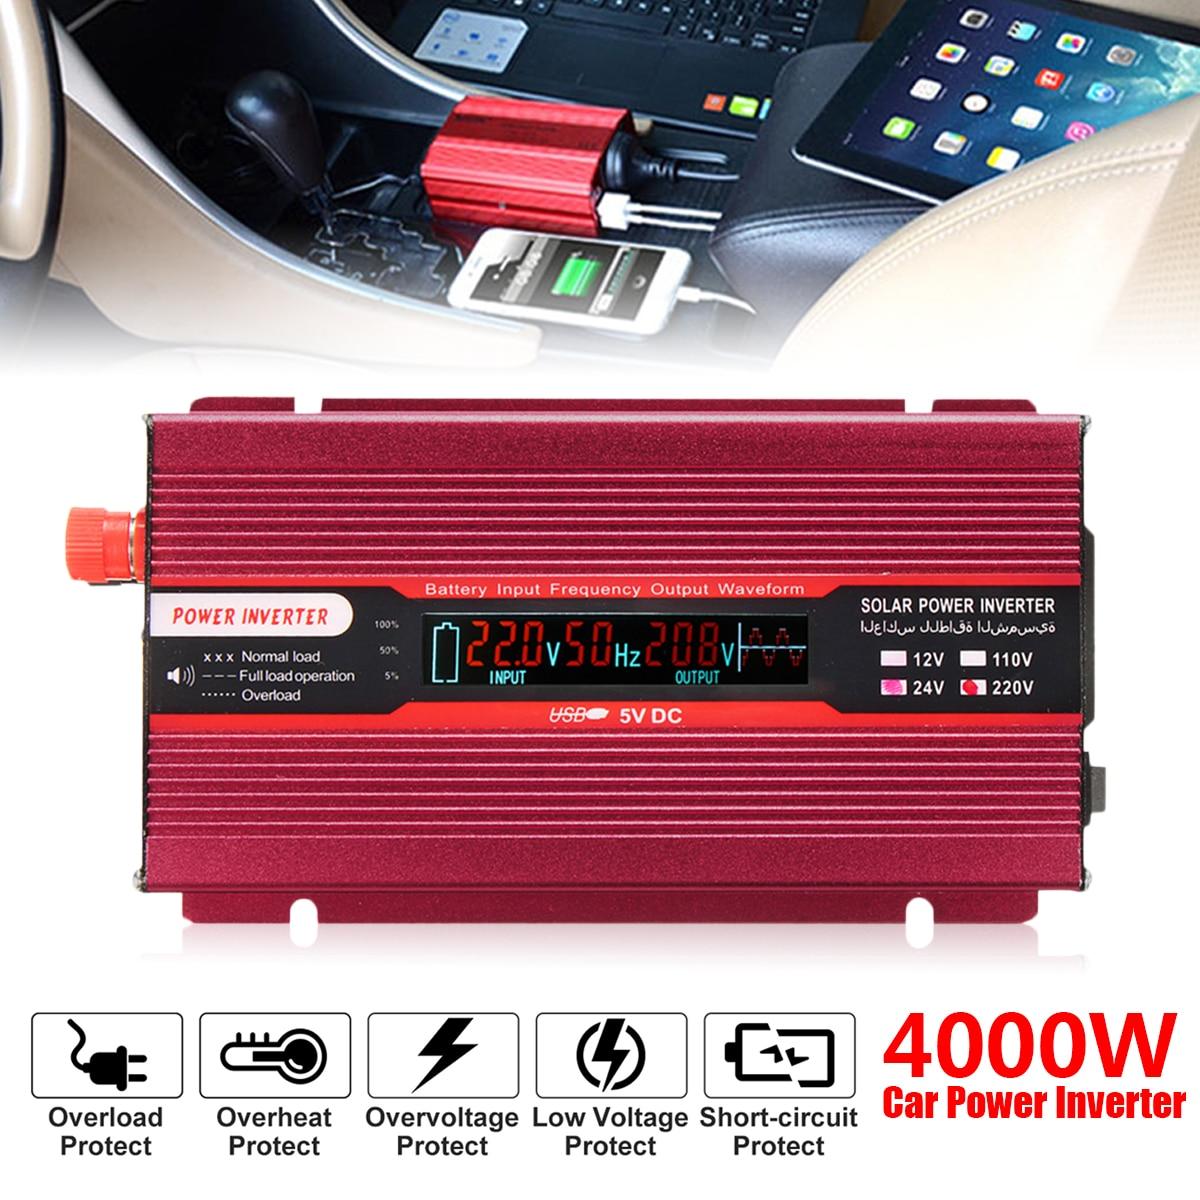 Voltage Transformer 12/24V To AC 220/110V PEAK 4000W Car Power Inverter USB Modified Sine Wave Converter Low Noise Protection